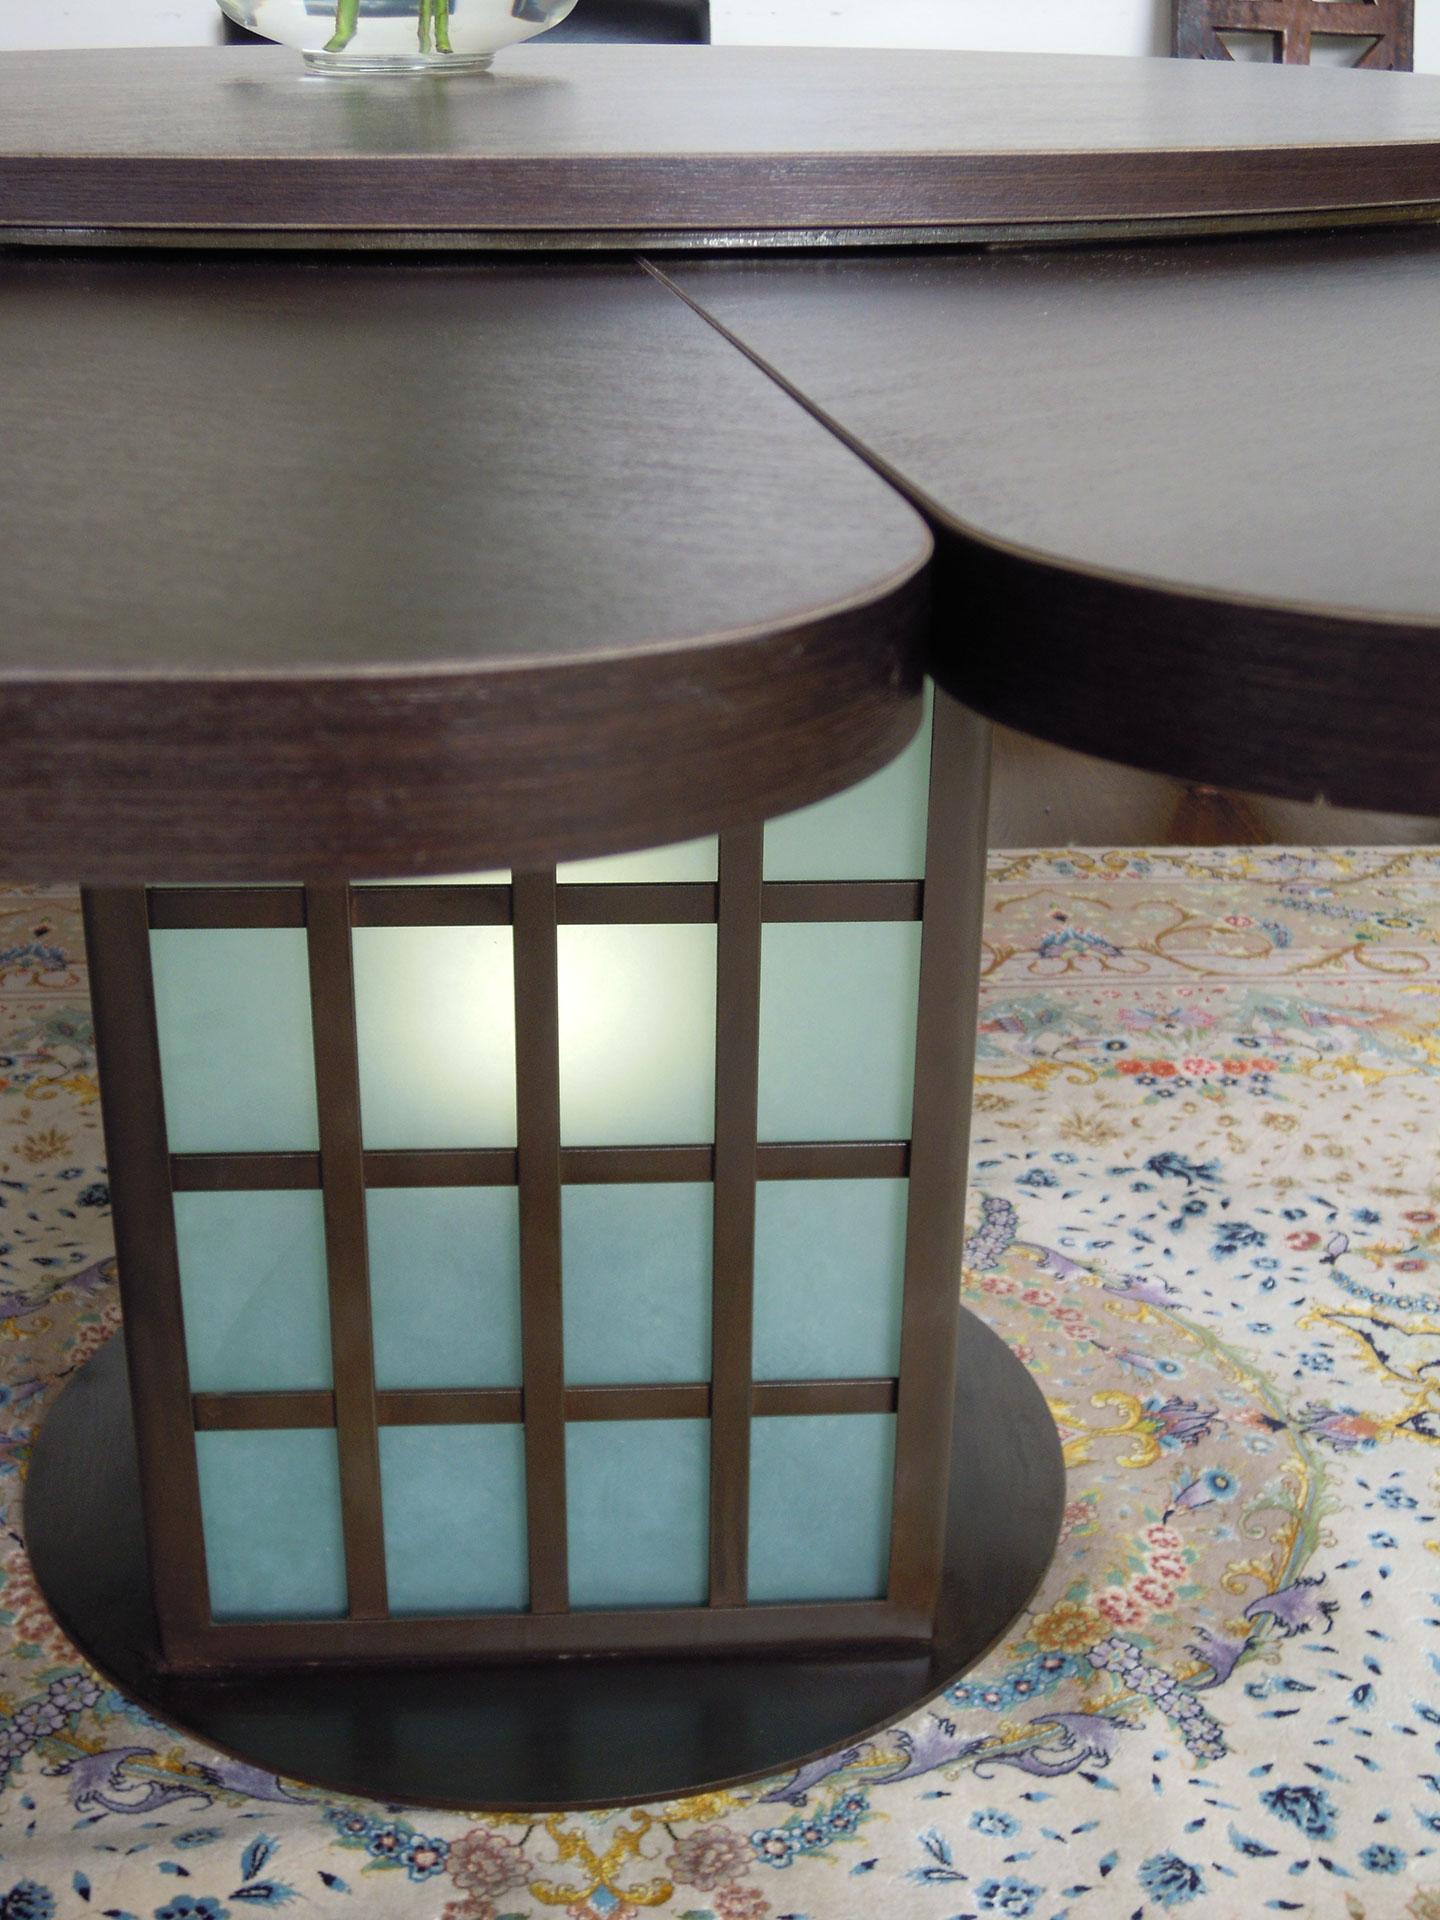 sakura-objet-design-sur-mesure-quasart-creations-web